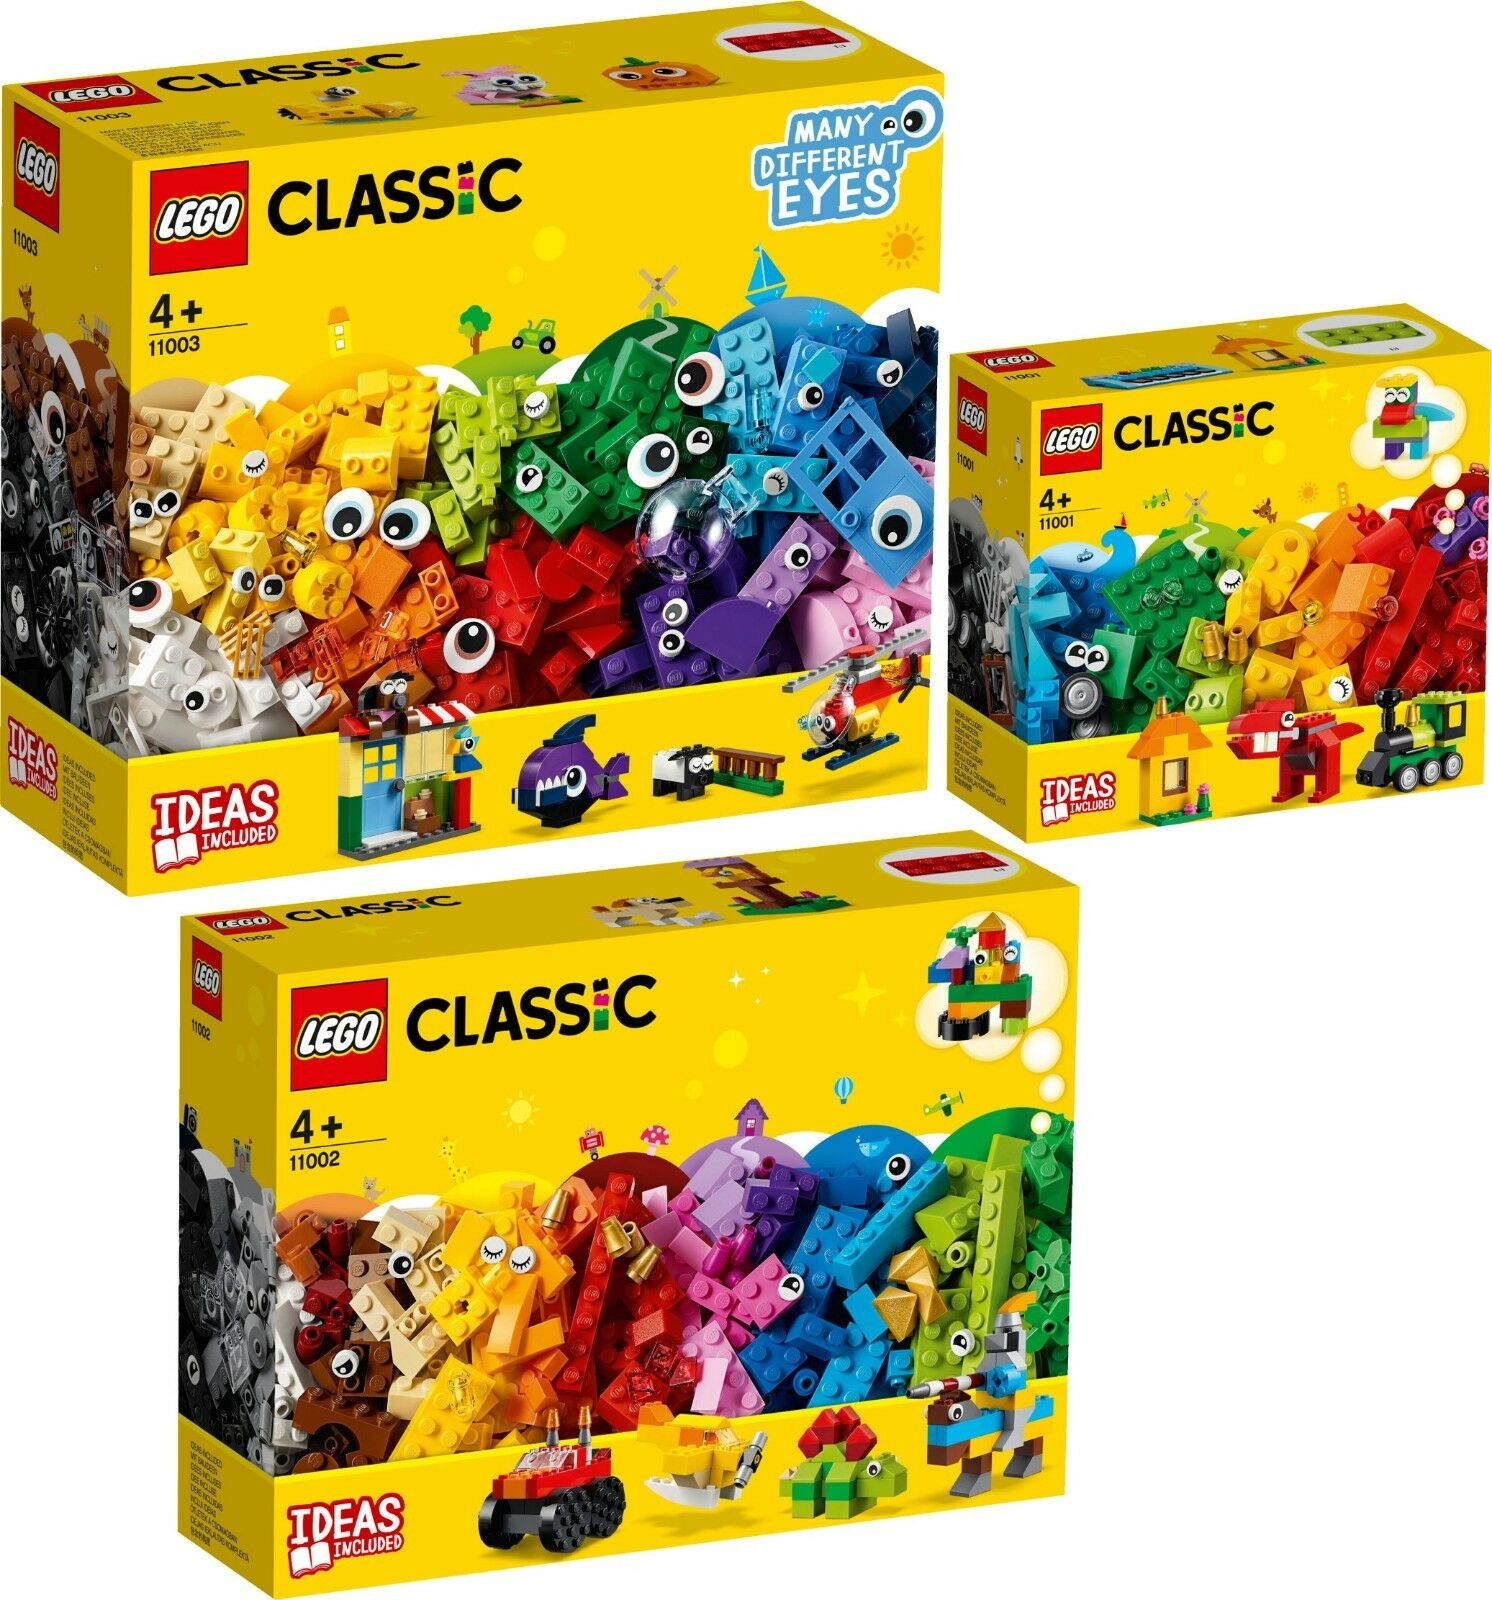 LEGO Classic 11003 11002 11001 Bausteine Witzige Figuren Bauspaß VORVERKAUF